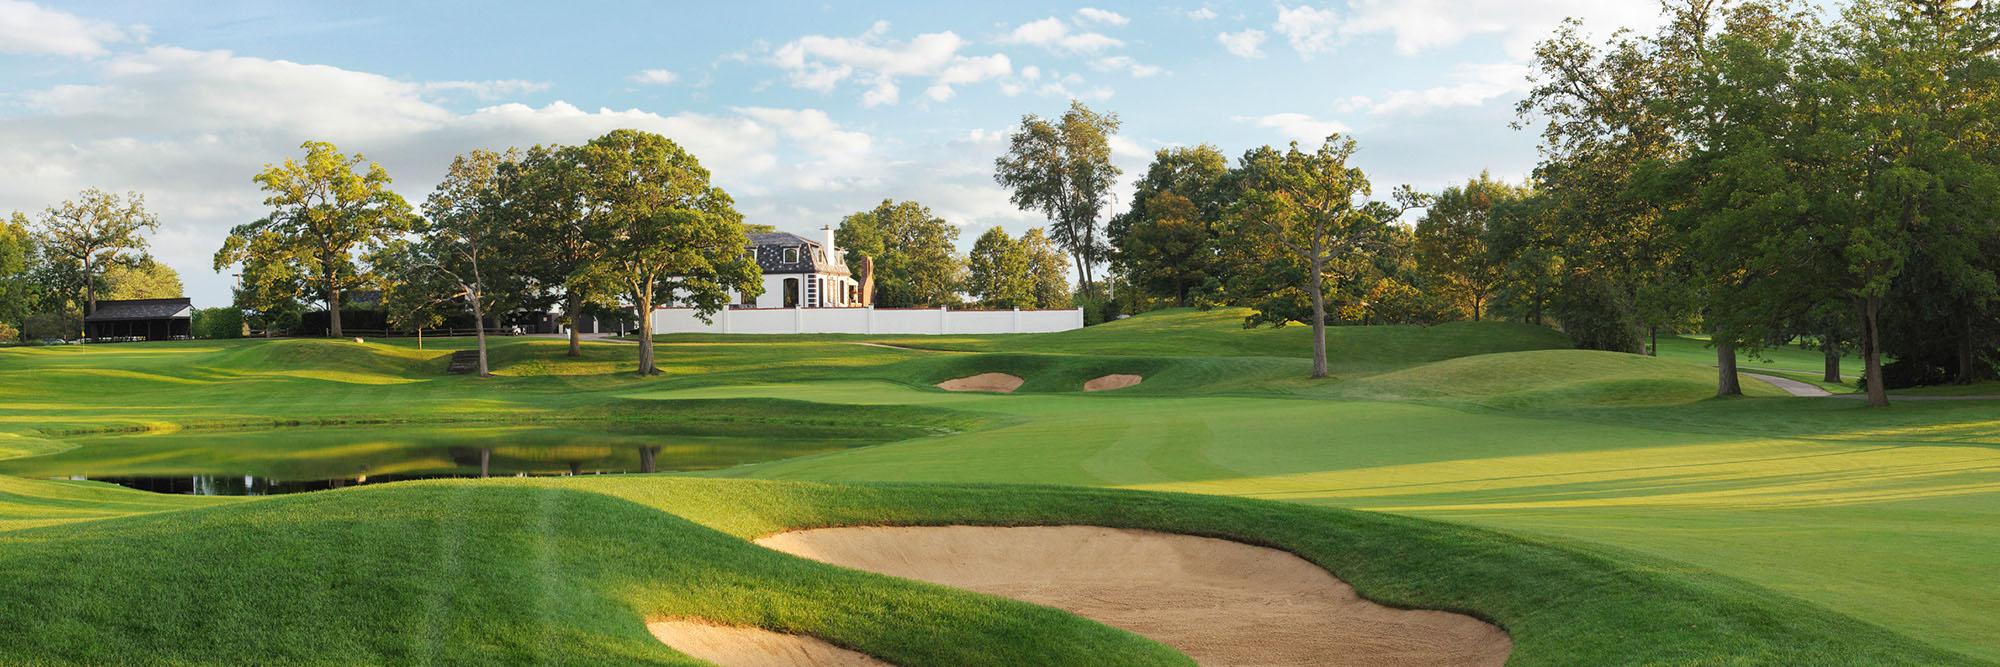 Golf Course Image - Cog Hill 4 No. 18